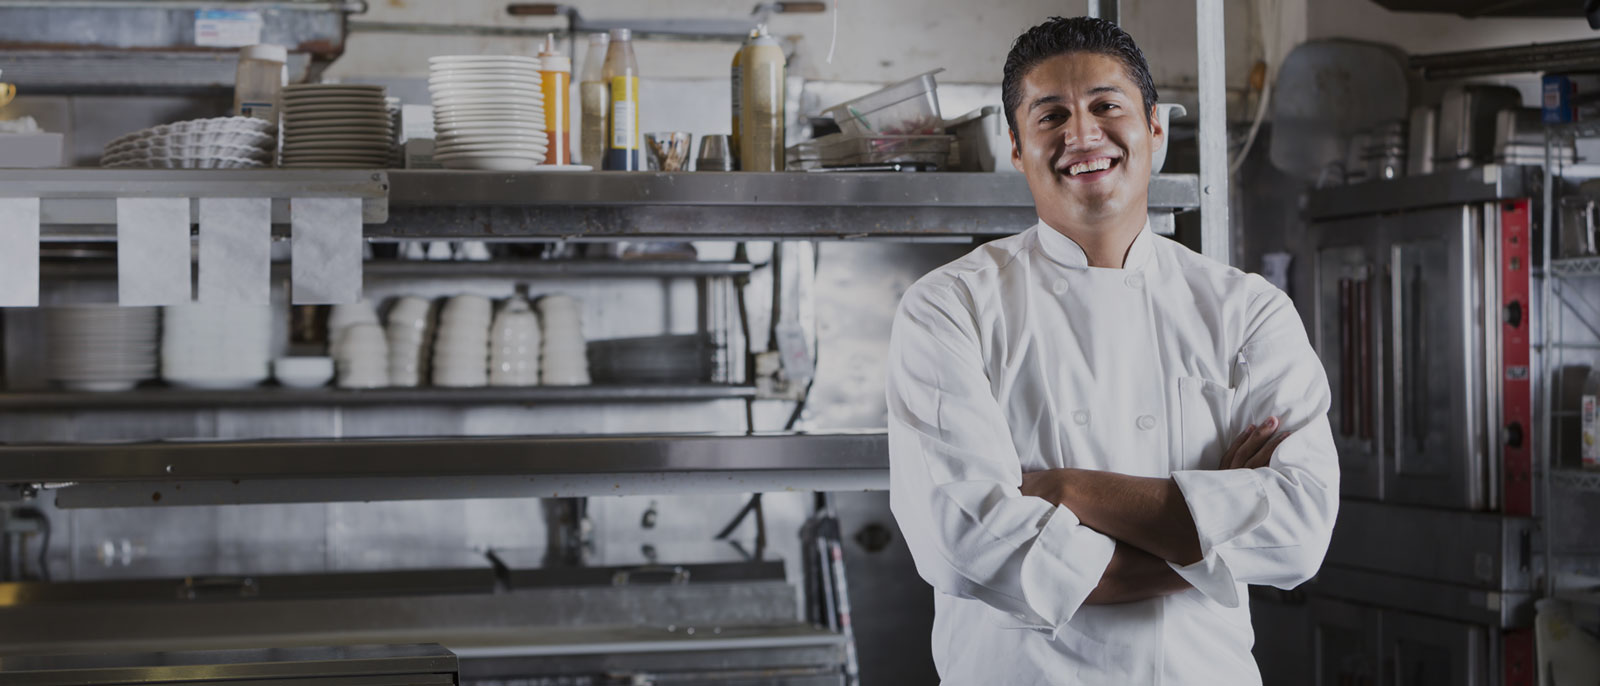 Kitchen Equipment For Restaurants Amp Homes R M Flagg